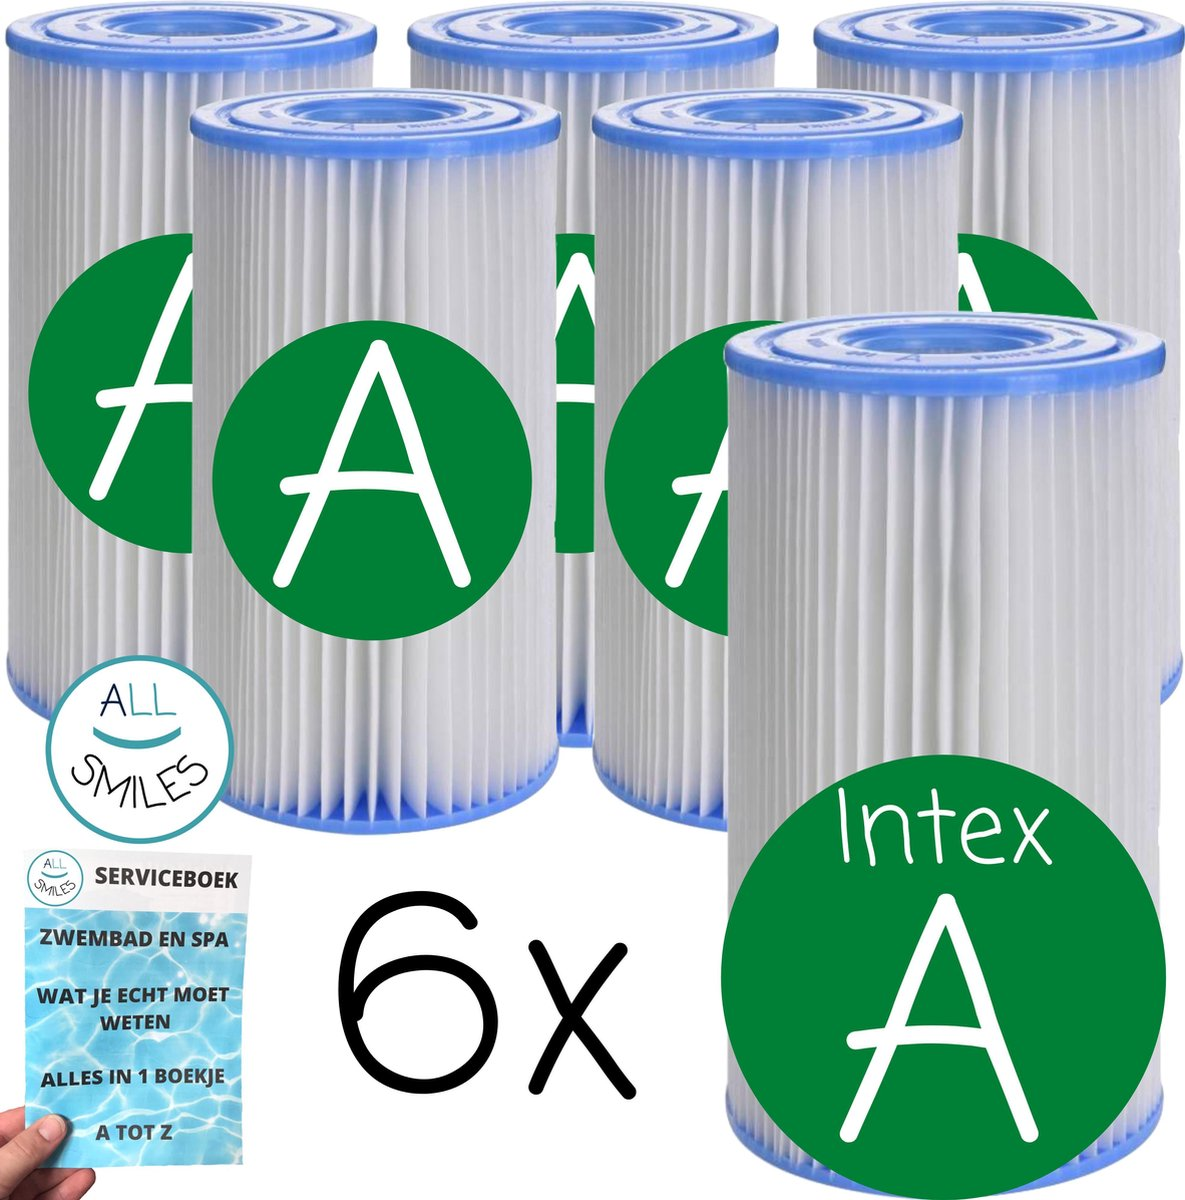 6 x Filter A ✅ Intex Filter Zwembad Onderhoud Filtercartridge Type A + Fysiek Serviceboek All Smiles